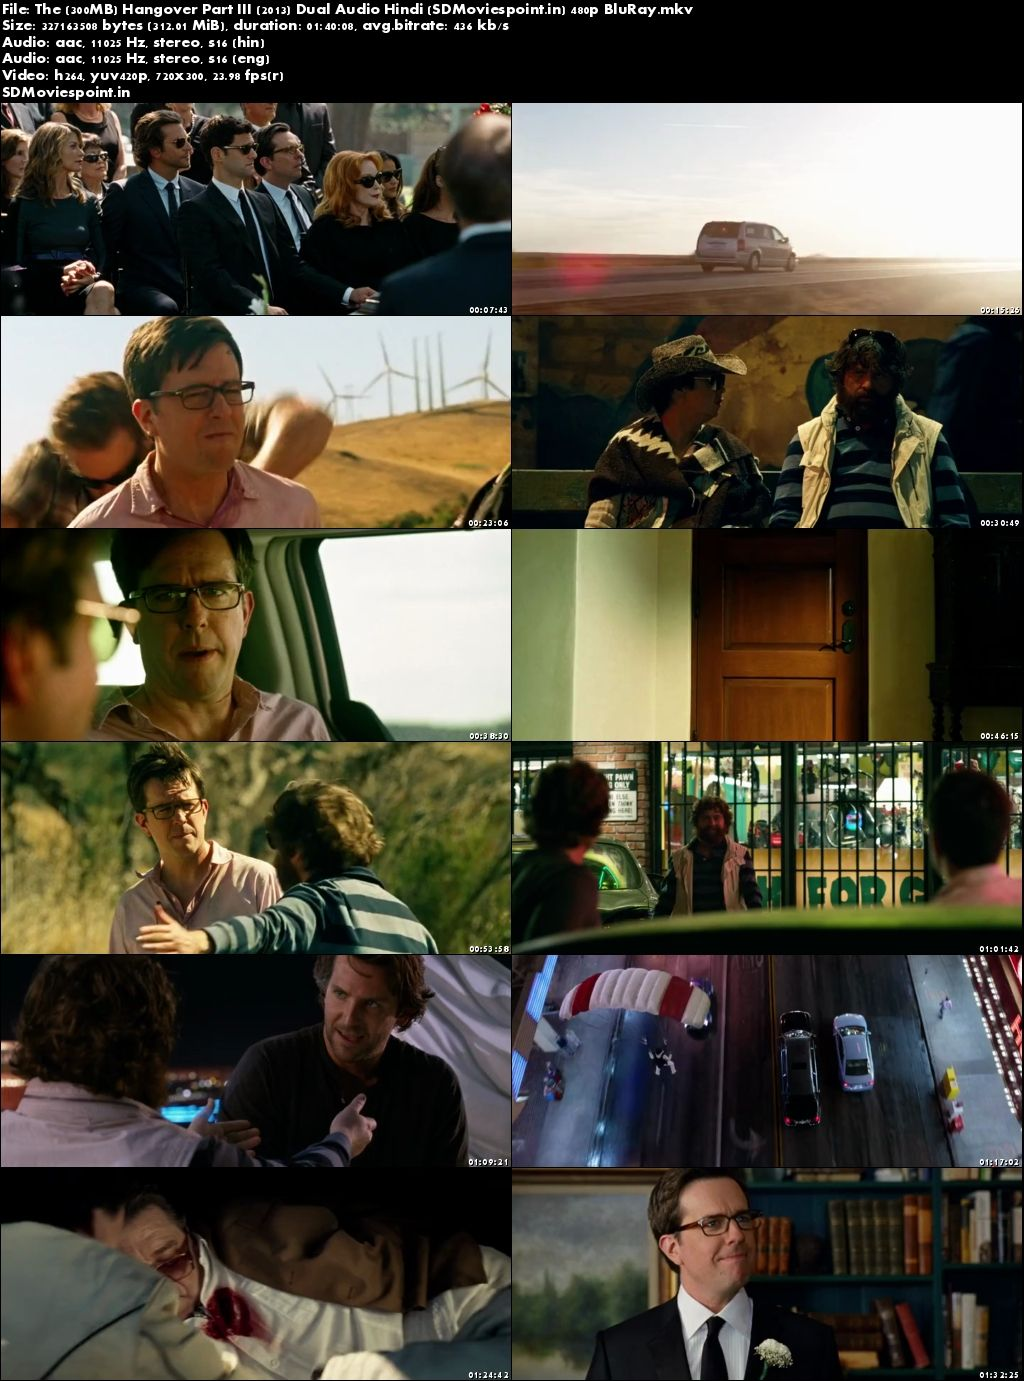 Screen Shos The Hangover Part III (2013) Full Hindi Movie Download 300MB